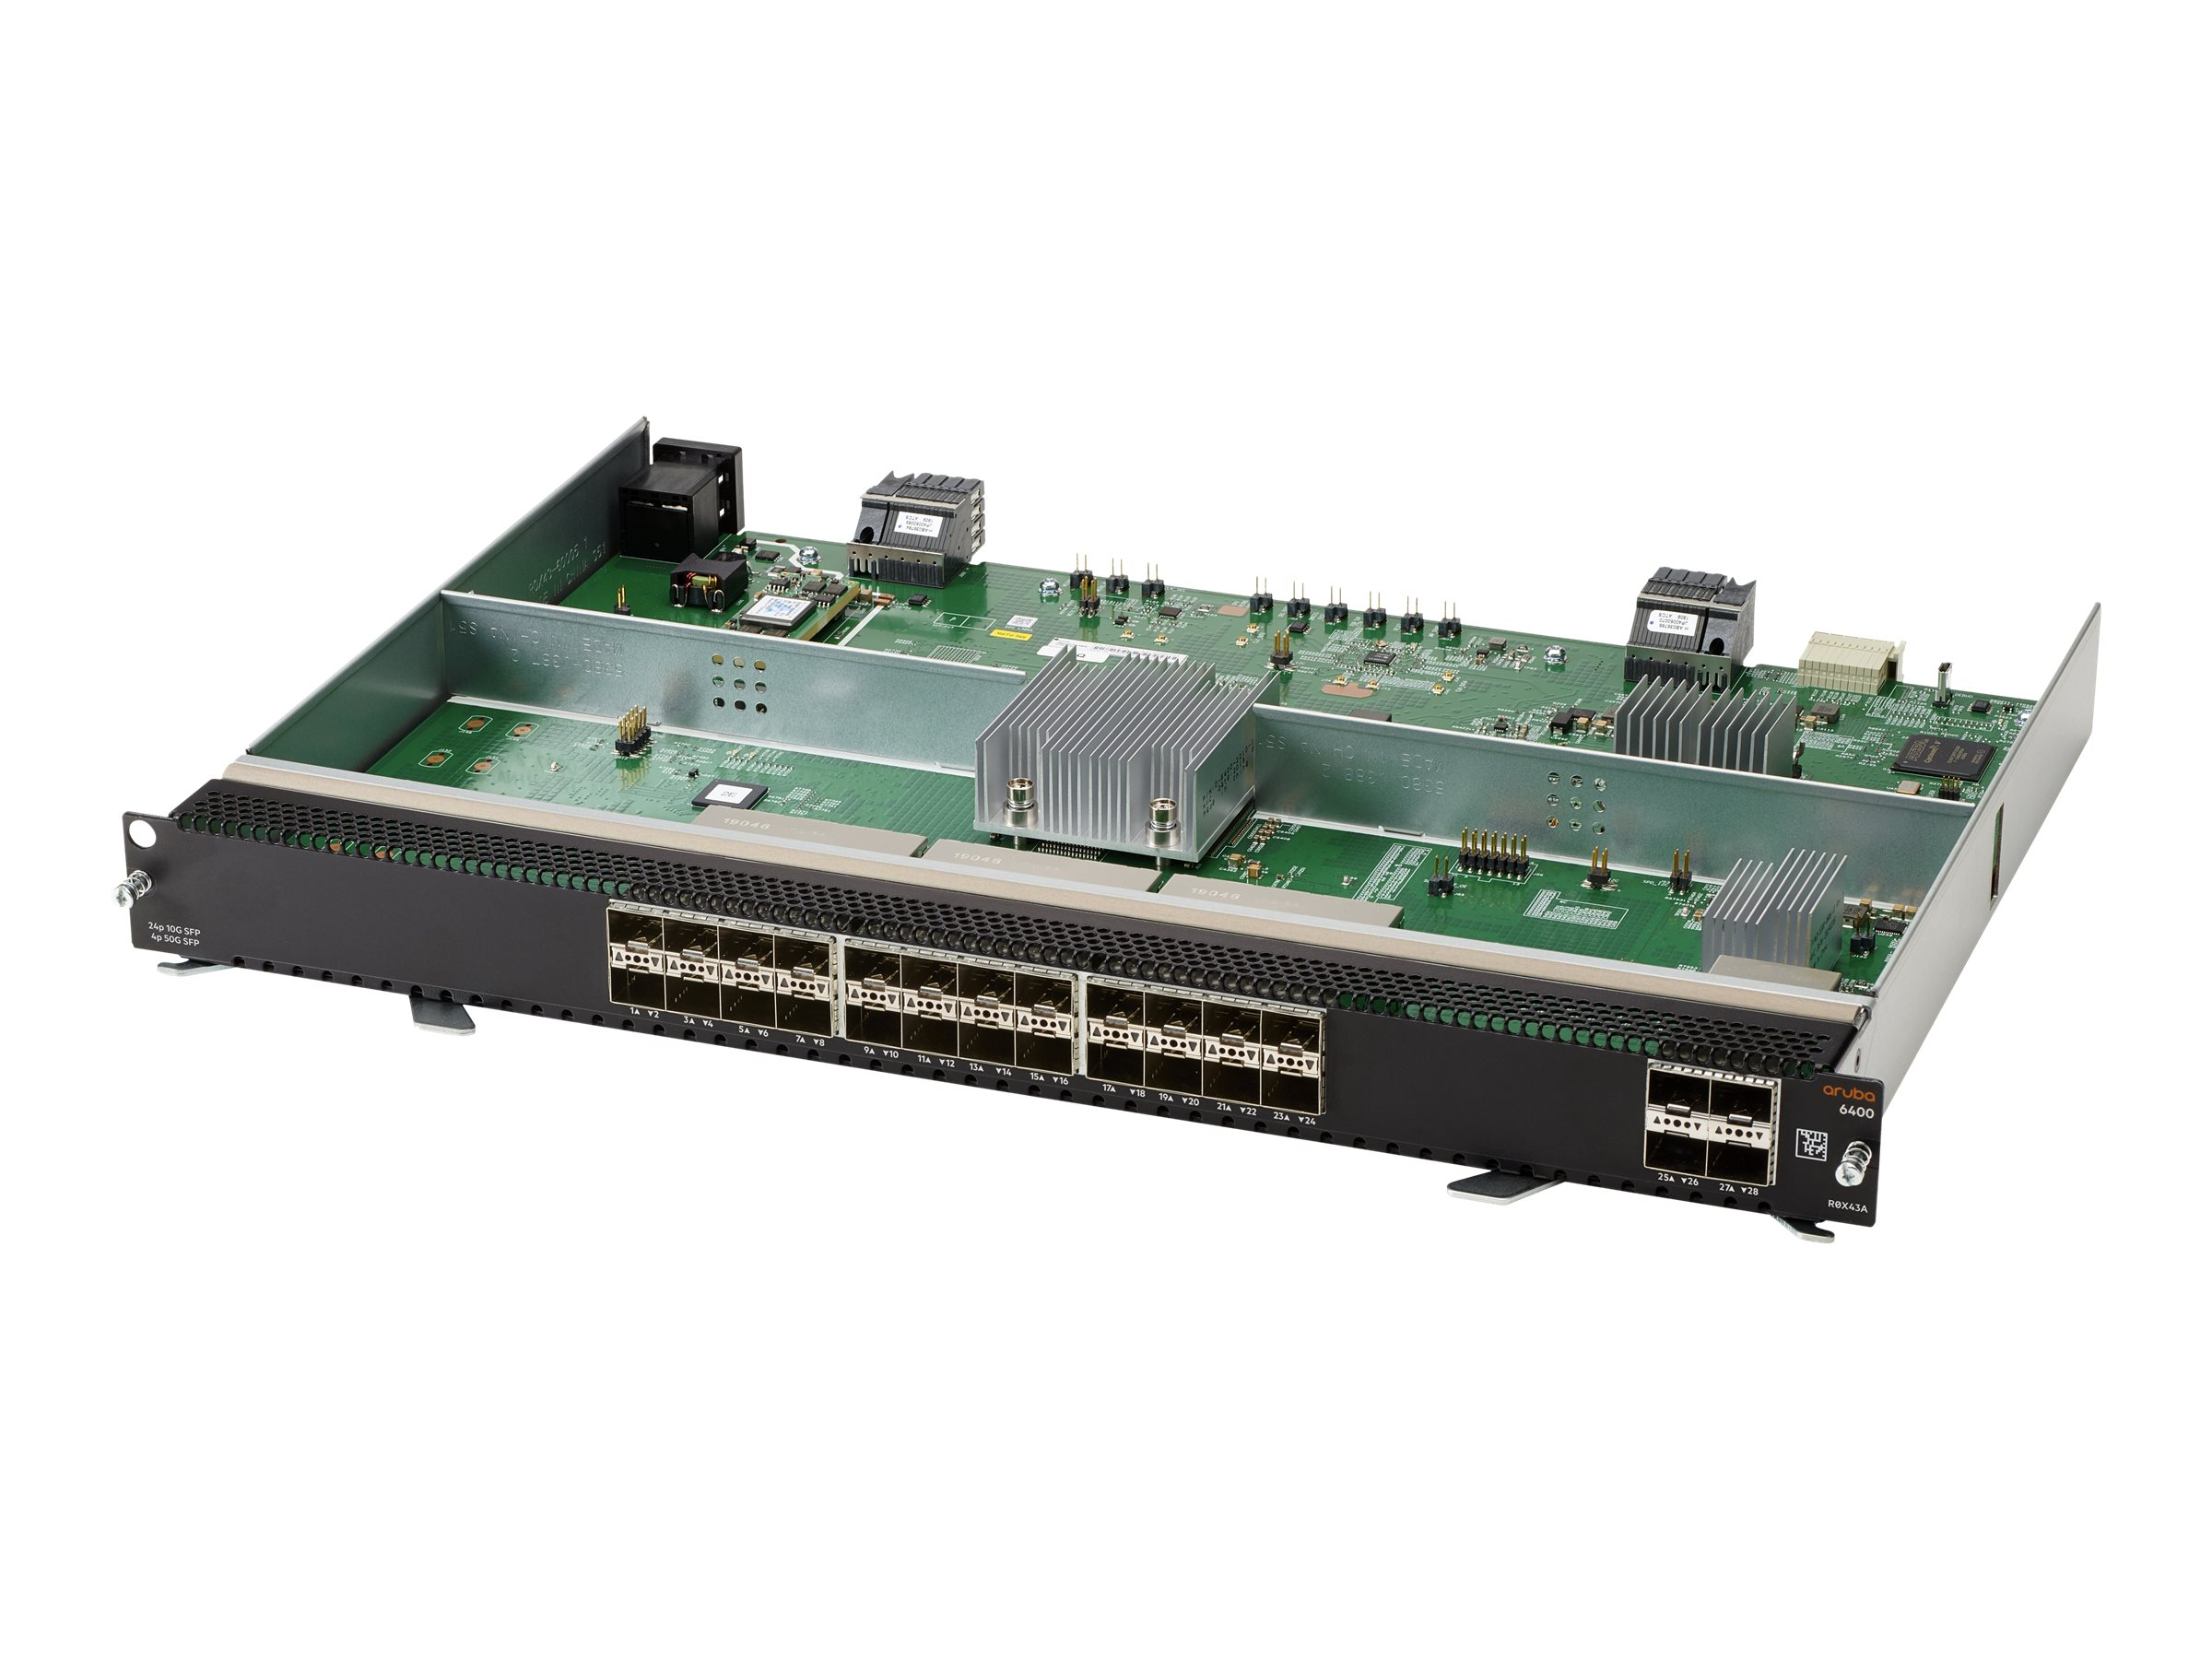 HPE Aruba 6400 - expansion module - 100M/1G/10 Gigabit Ethernet x 24 + 1Gb Ethernet/10Gb Ethernet/25Gb Ethernet/50Gb Ethernet SFP56 x 4